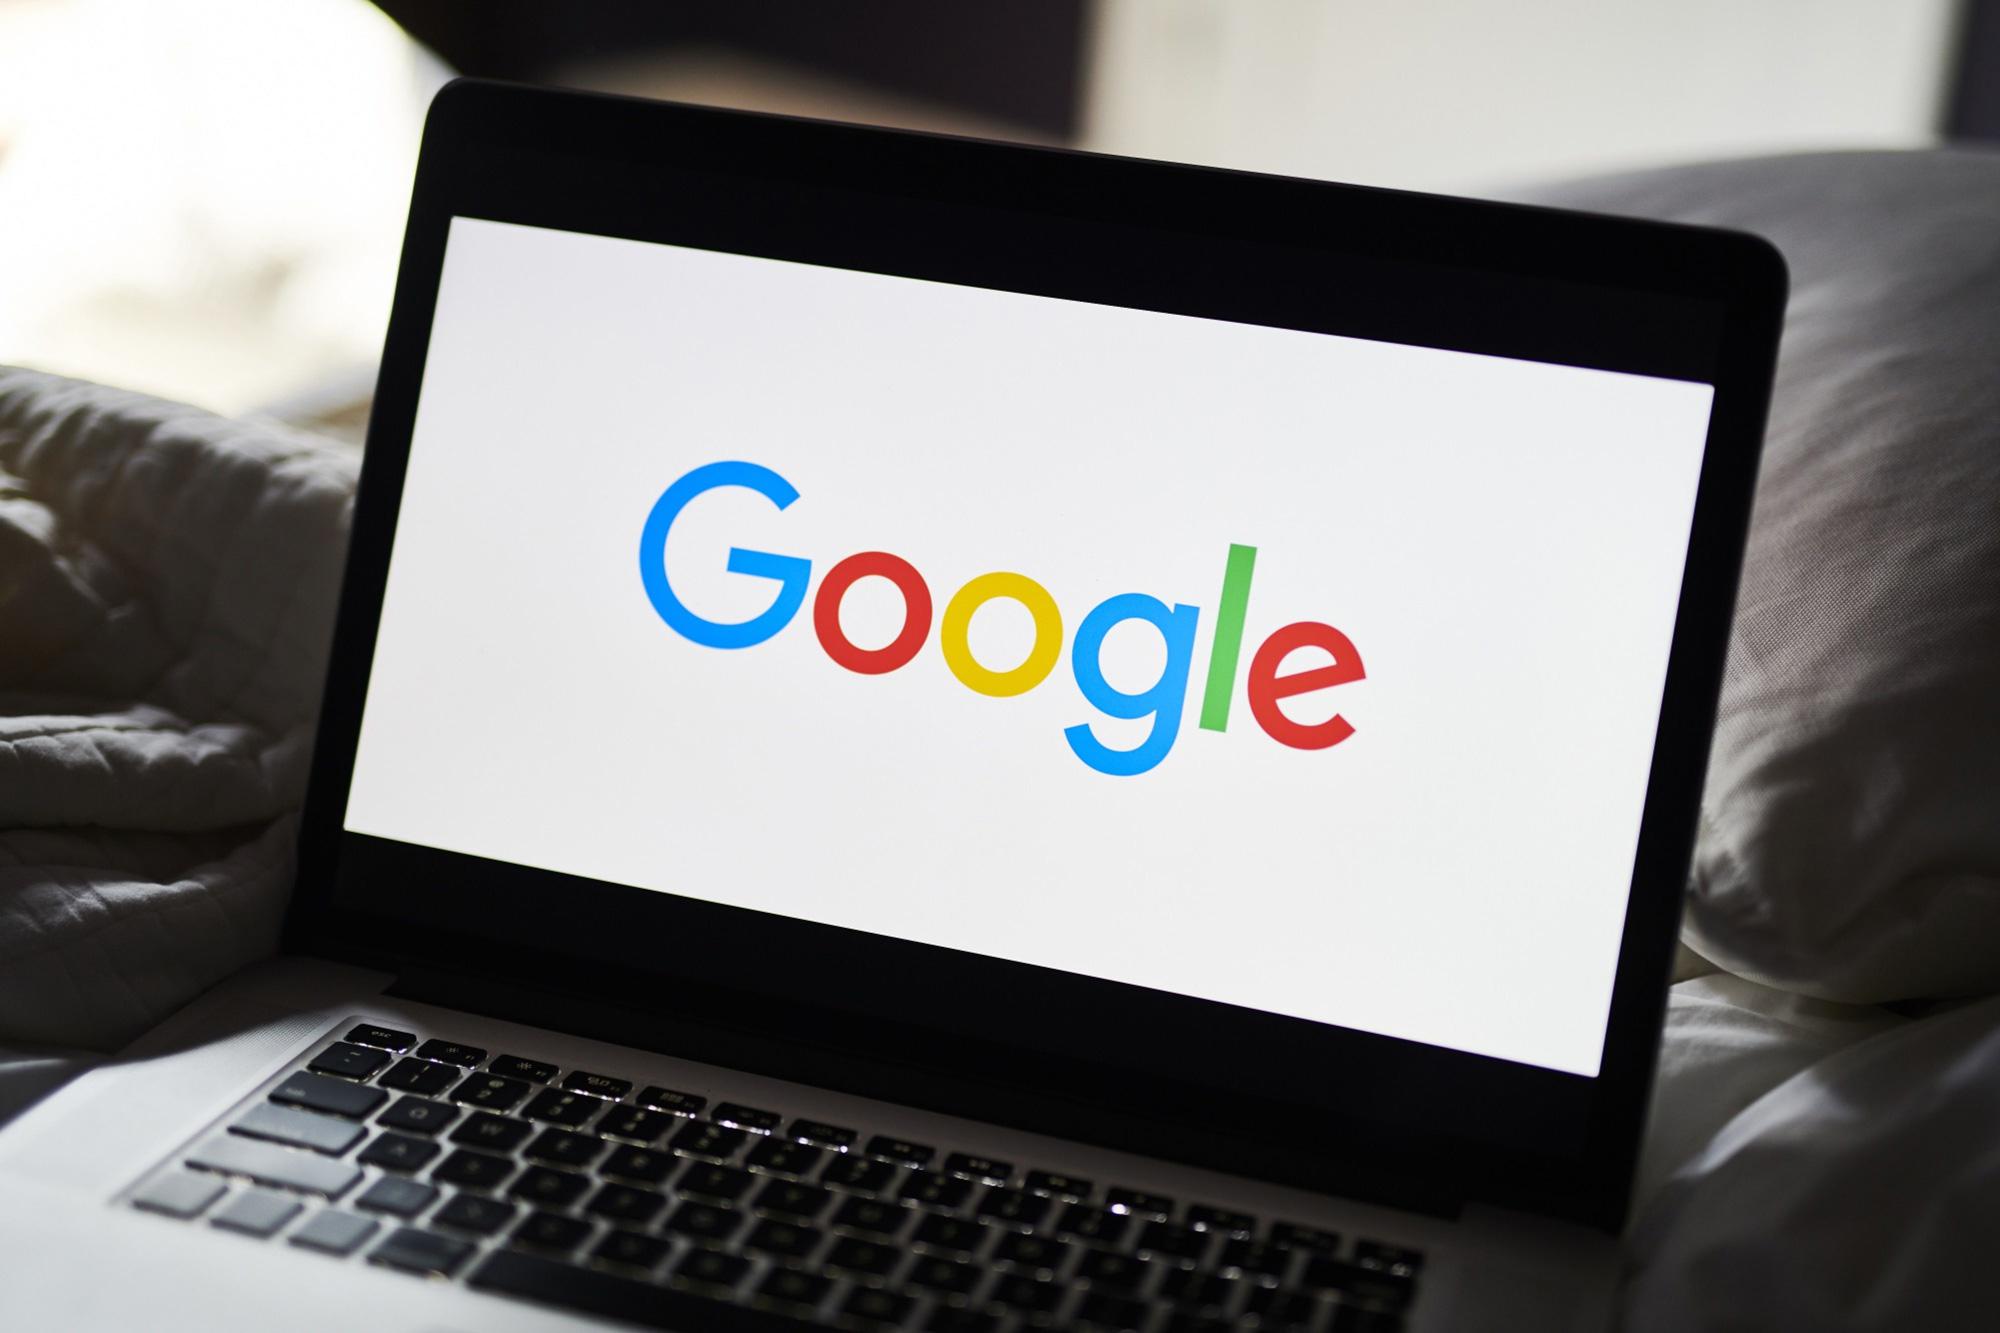 Google parent Alphabet nears $1 trillion market cap on ad-growth optimism